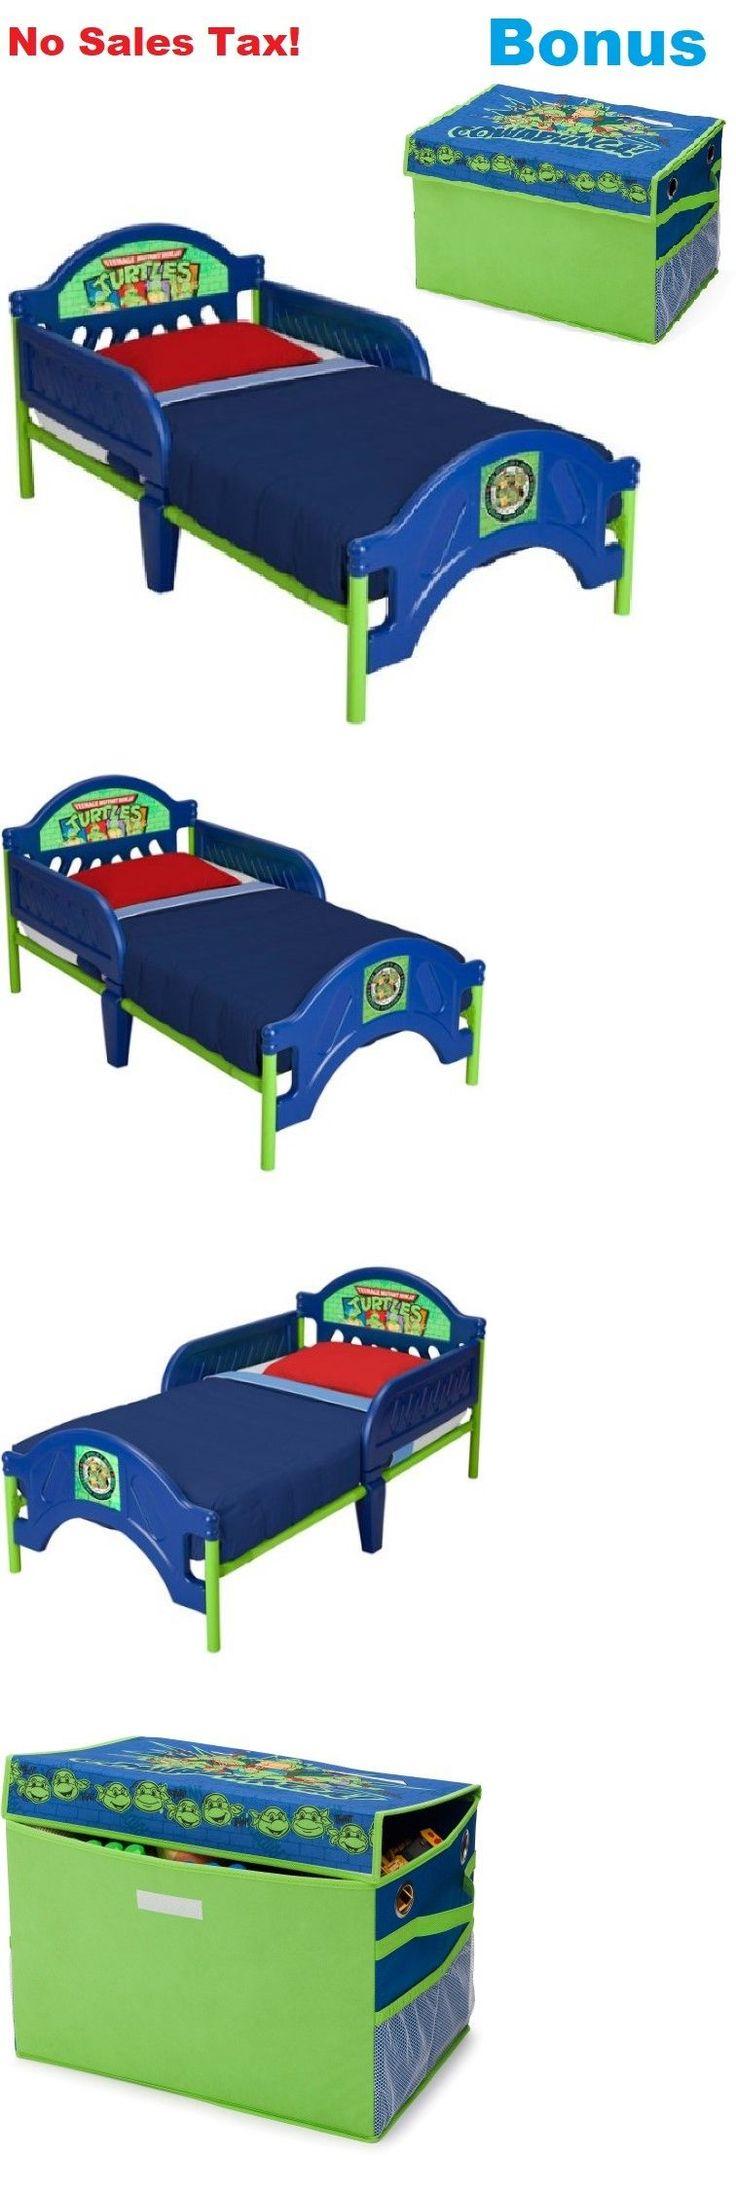 Bedroom Furniture 66742: Toddler Bed W Bonus Collapsible Toy Box Teenage Mutant Ninja Turtles Kids New -> BUY IT NOW ONLY: $79.99 on eBay!